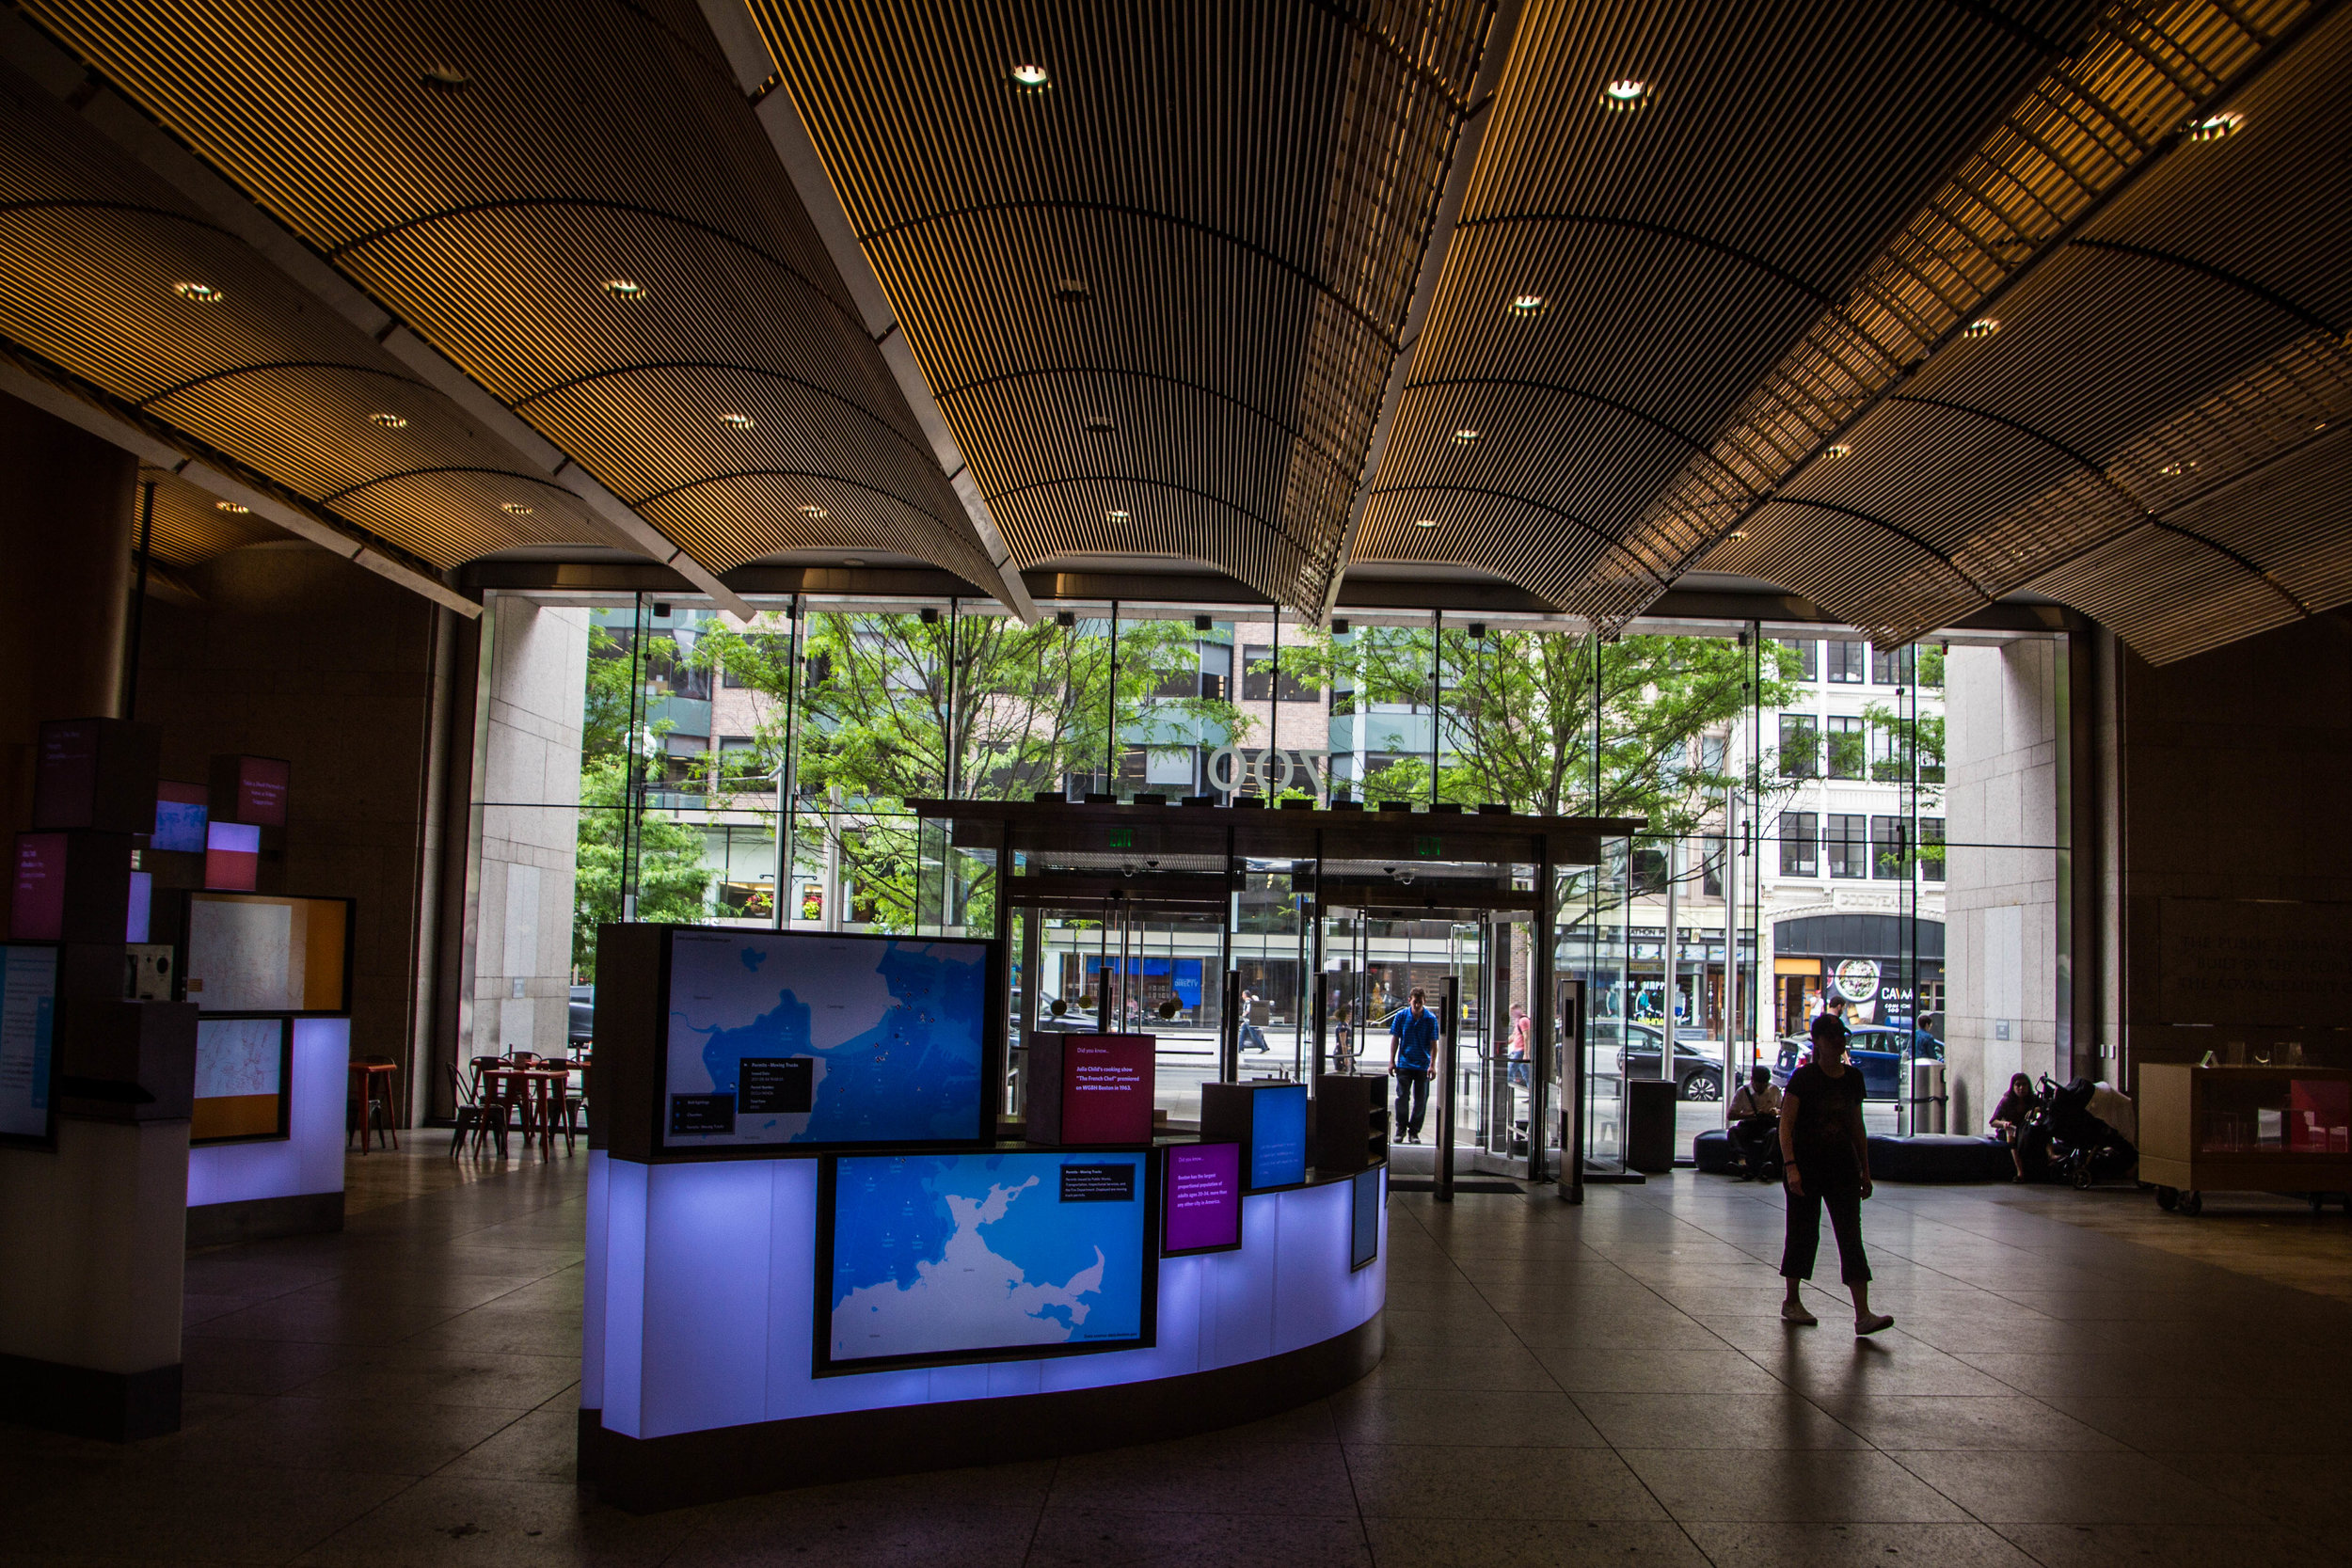 boston-public-library-photography-15.jpg